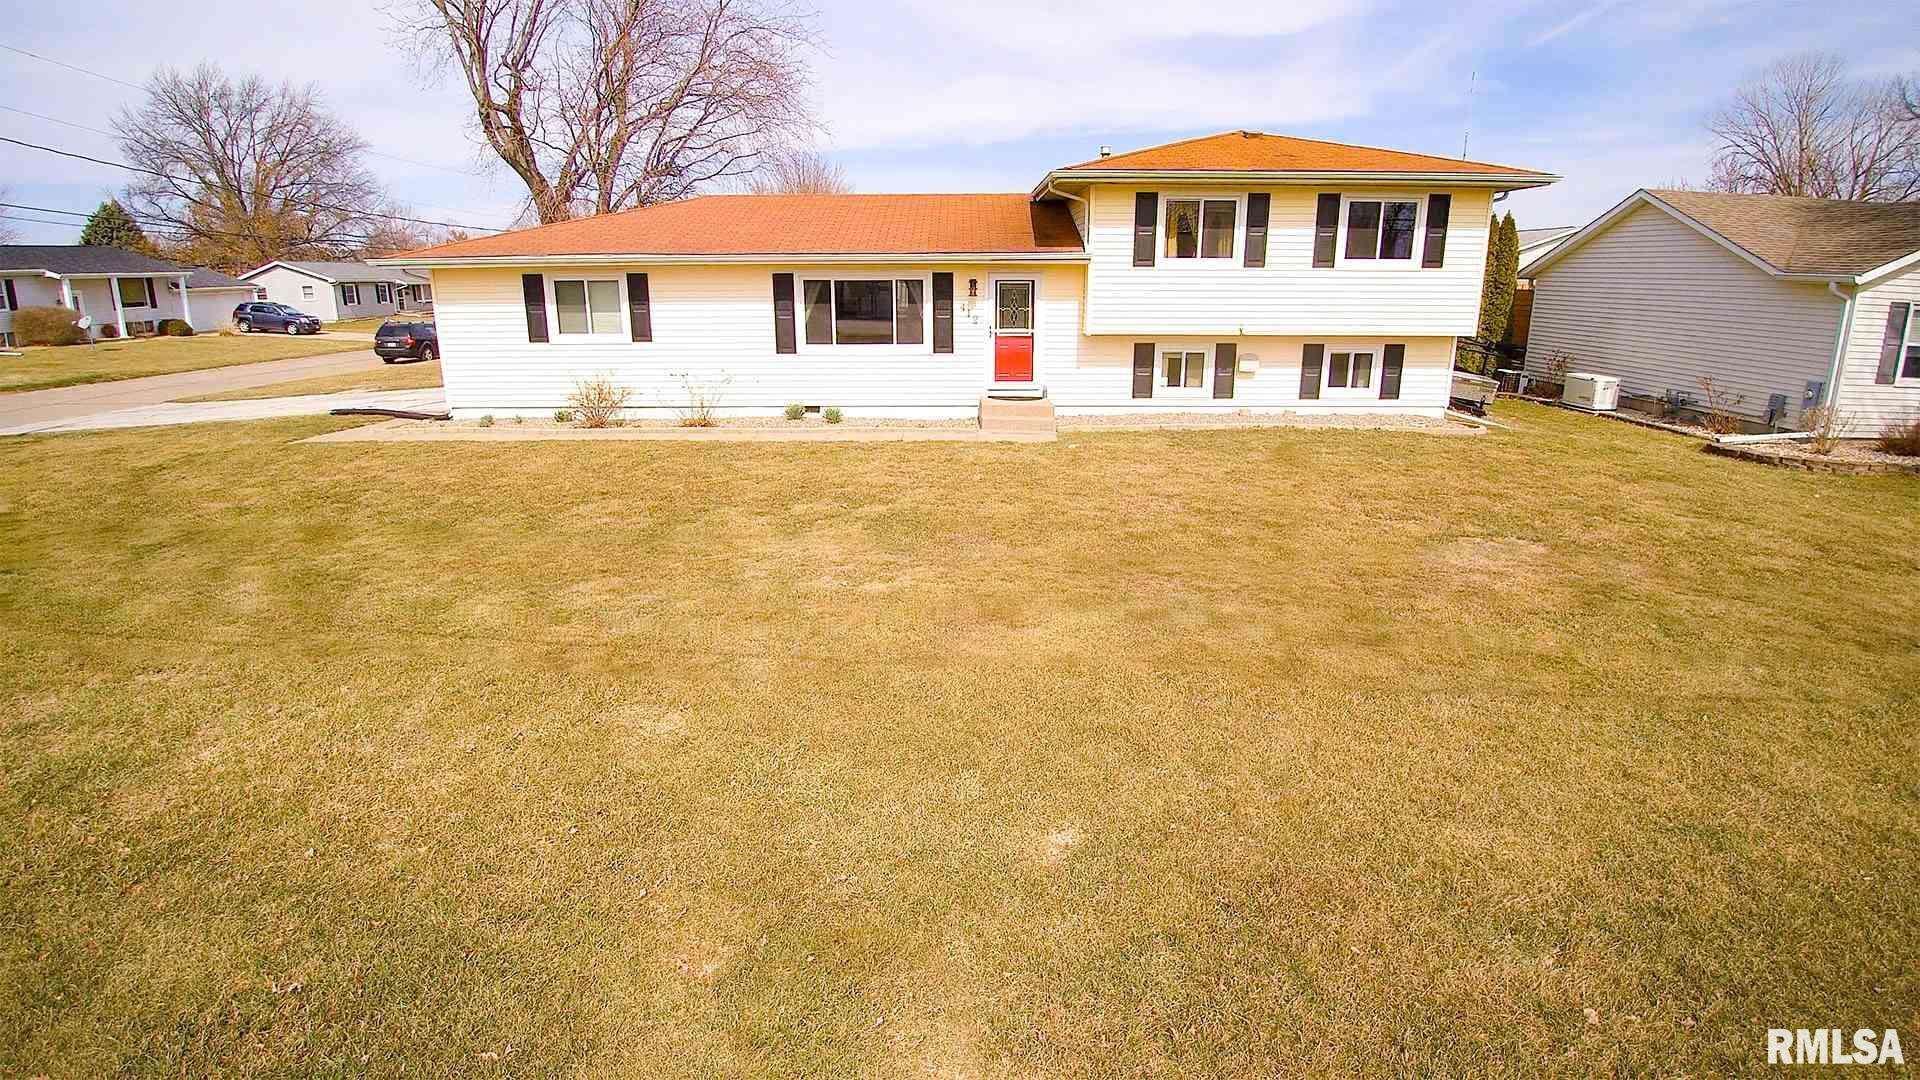 412 E 19TH Property Photo - Coal Valley, IL real estate listing